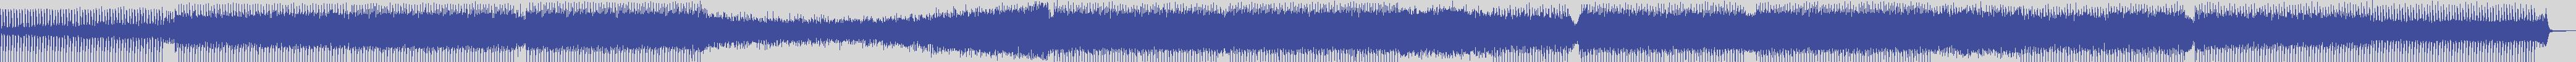 just_digital_records [JS1321] Bardini Experience, Chris P - The Movie [Progression Mix] audio wave form